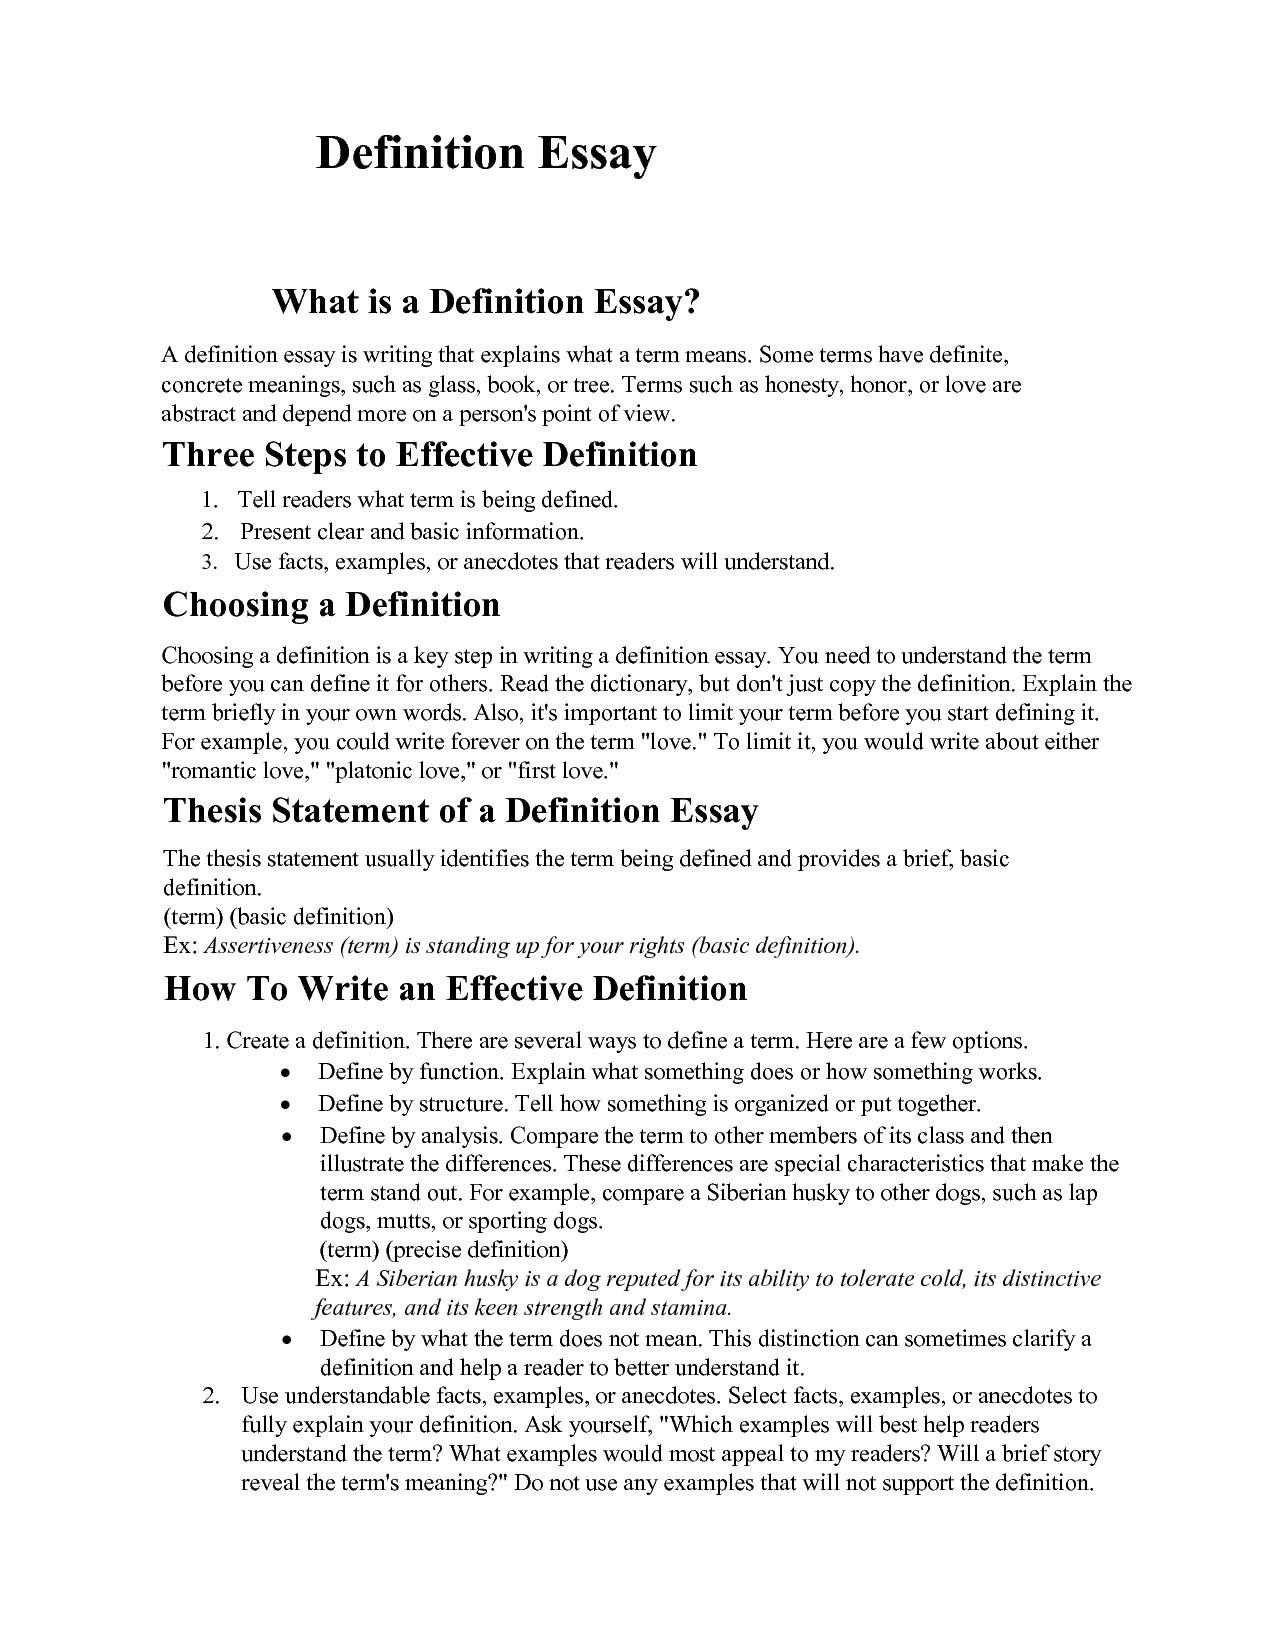 definition essay paper hero definition essay examples  definition essay examples friendship bunch ideas of definition essay  examples friendship bunch ideas of controversial topics